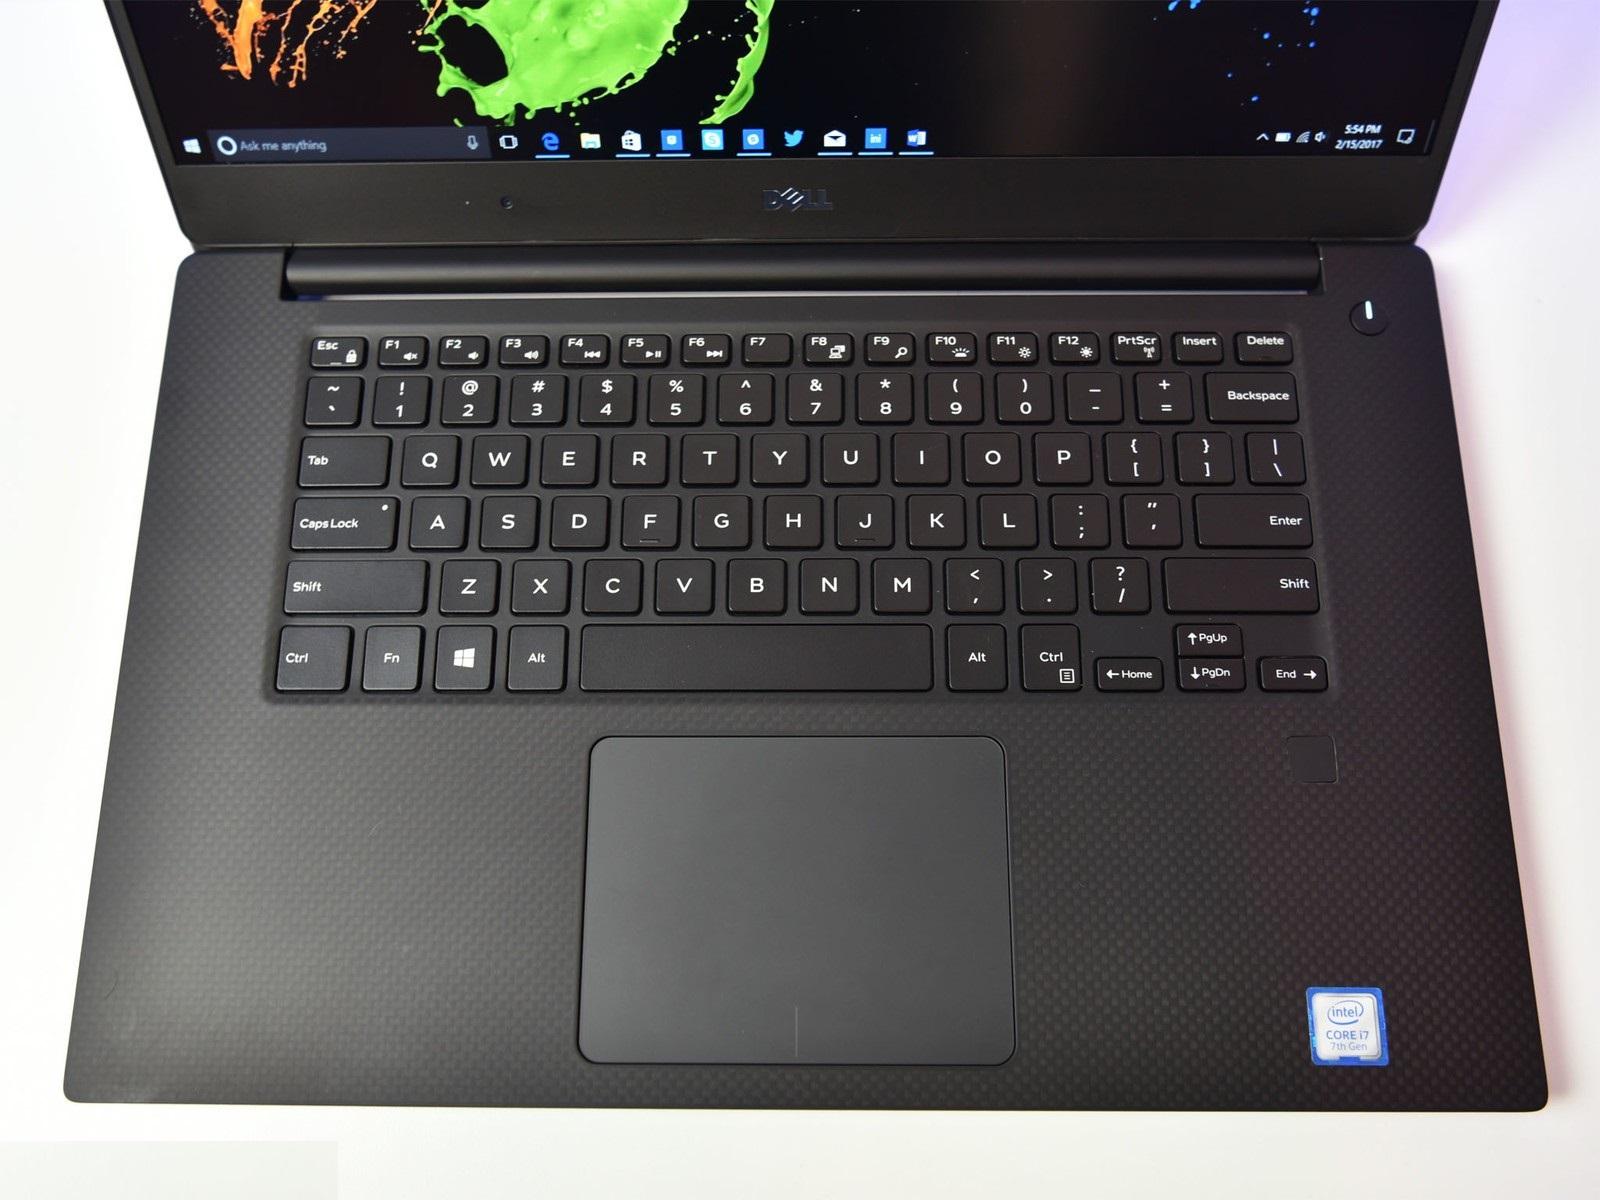 Dell XPS 15 9530 kết nối internet